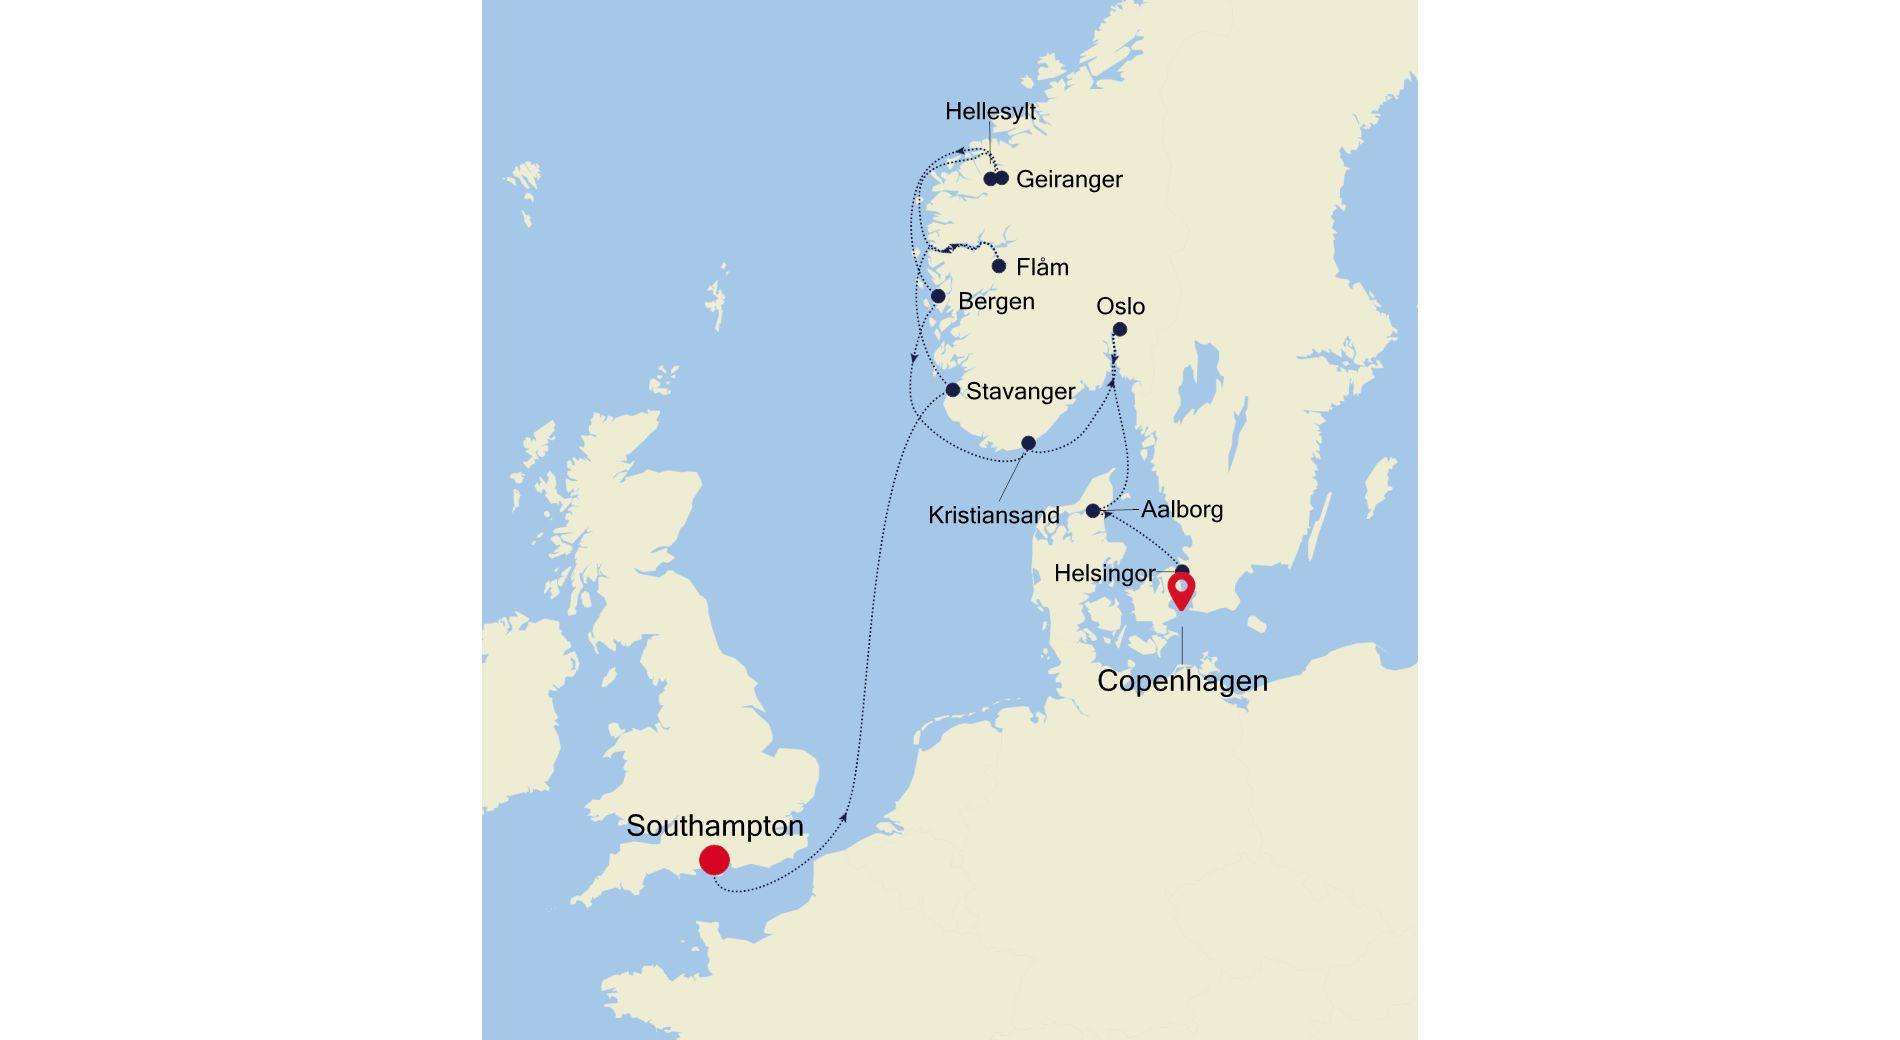 SL210610012 - Southampton à Copenhagen